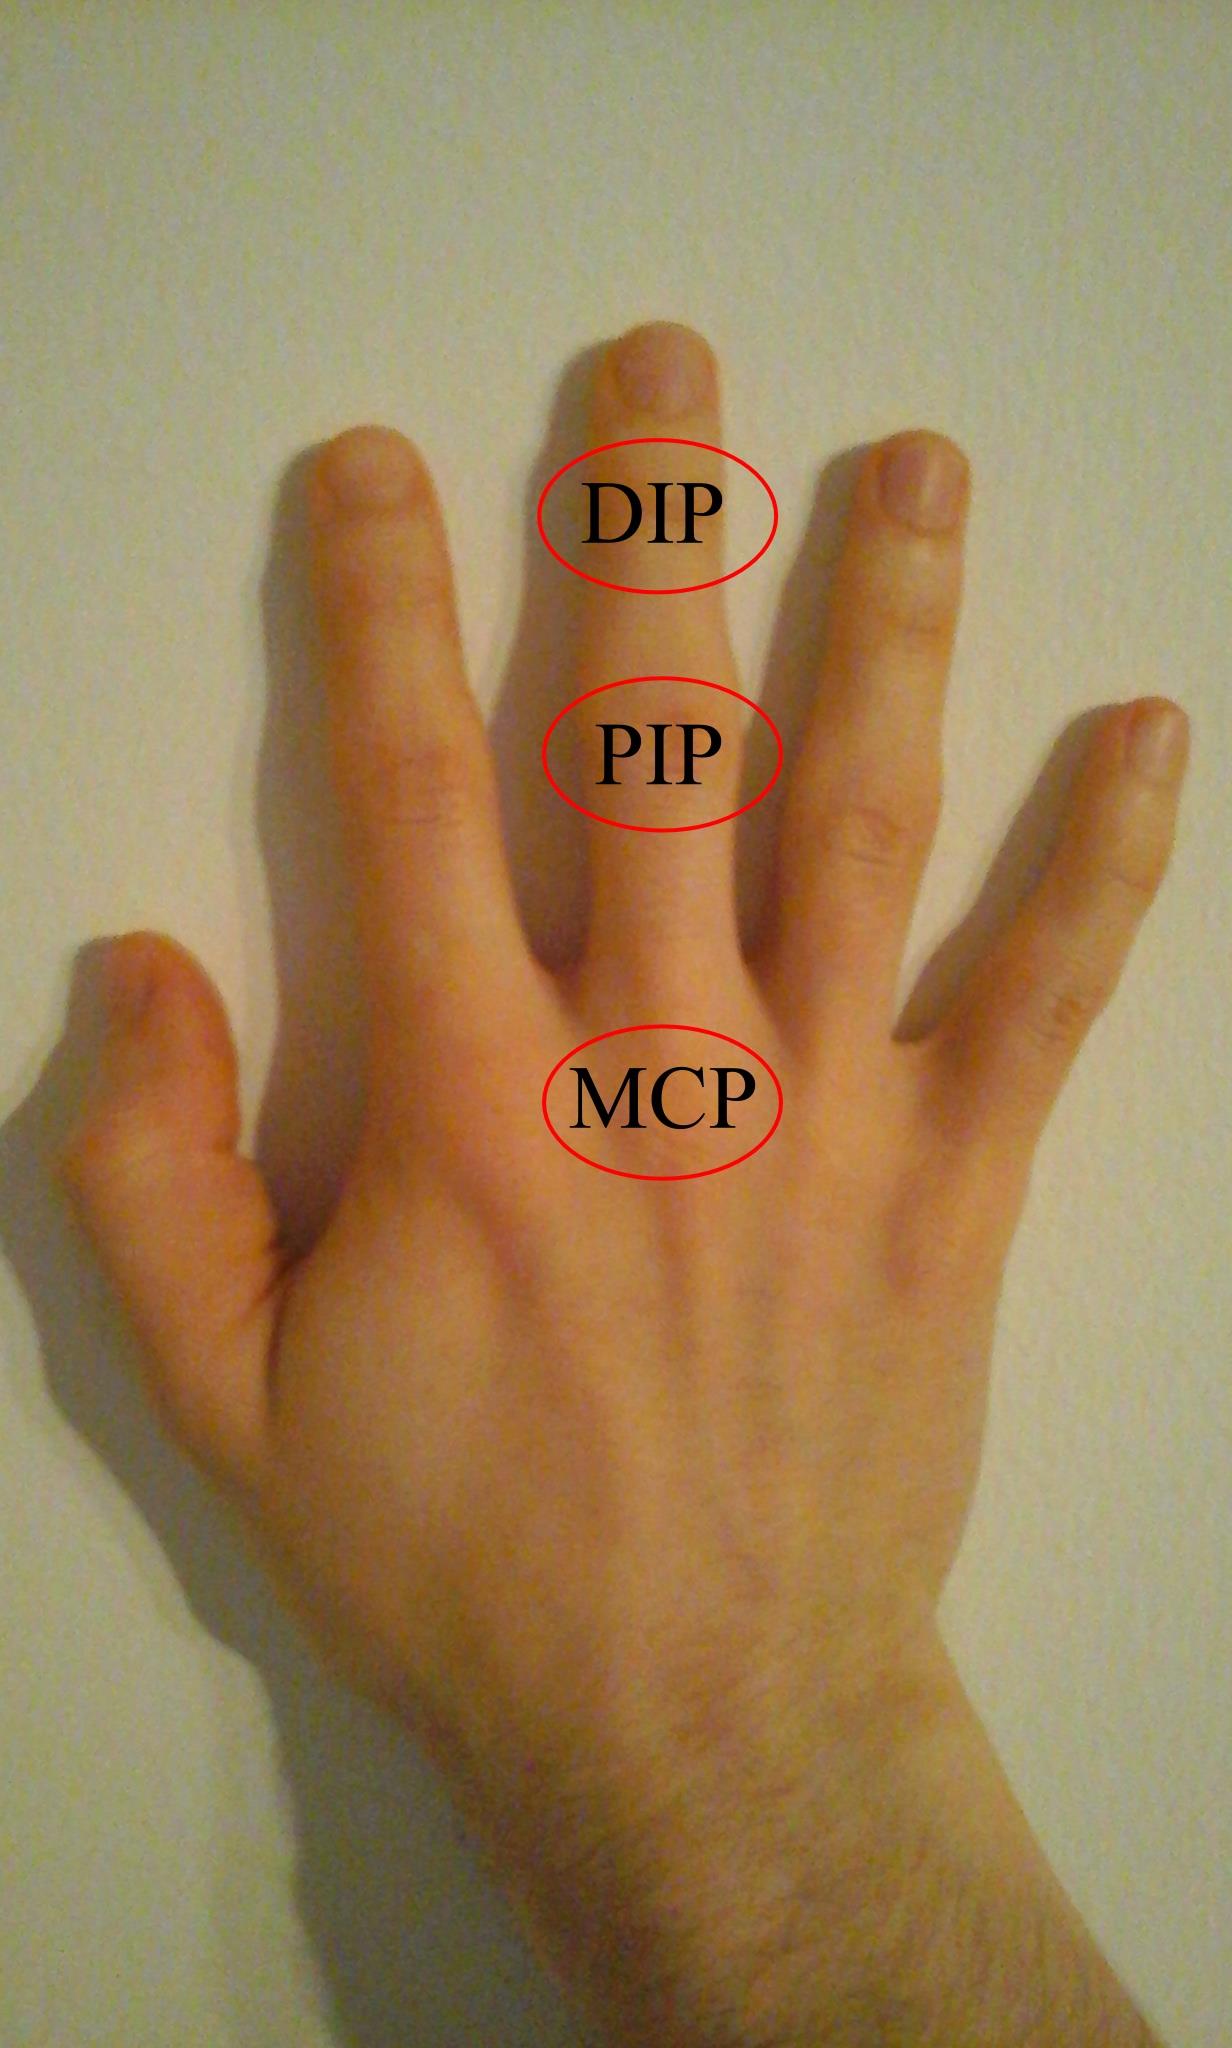 a térd artritisz radiológiai tünetei